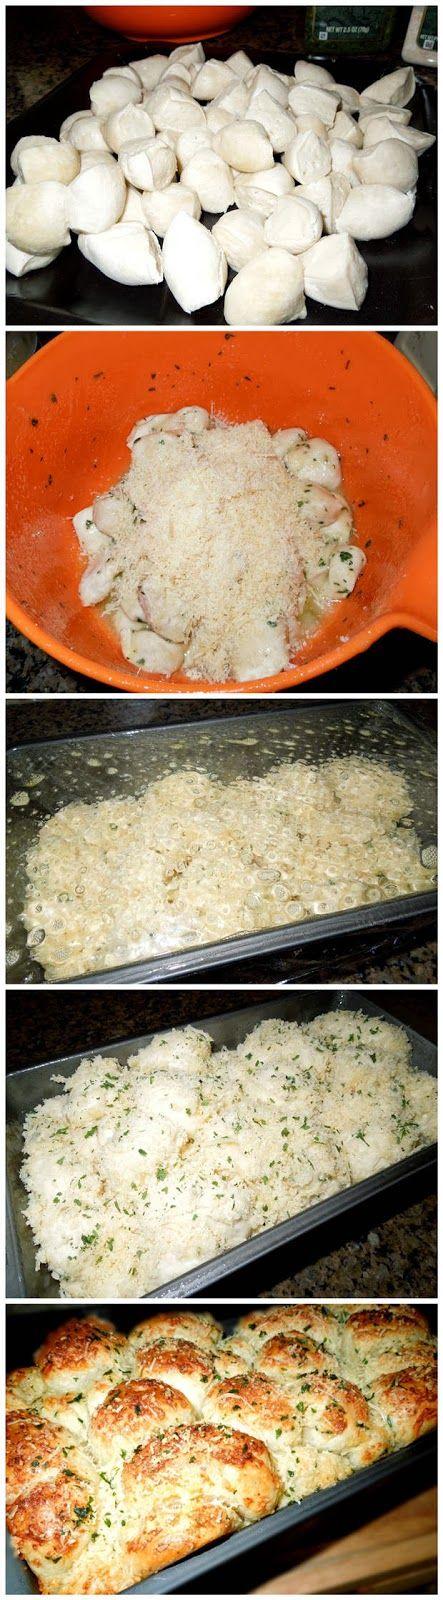 Garlic-Parmesan Cheese Pull Apart Bread